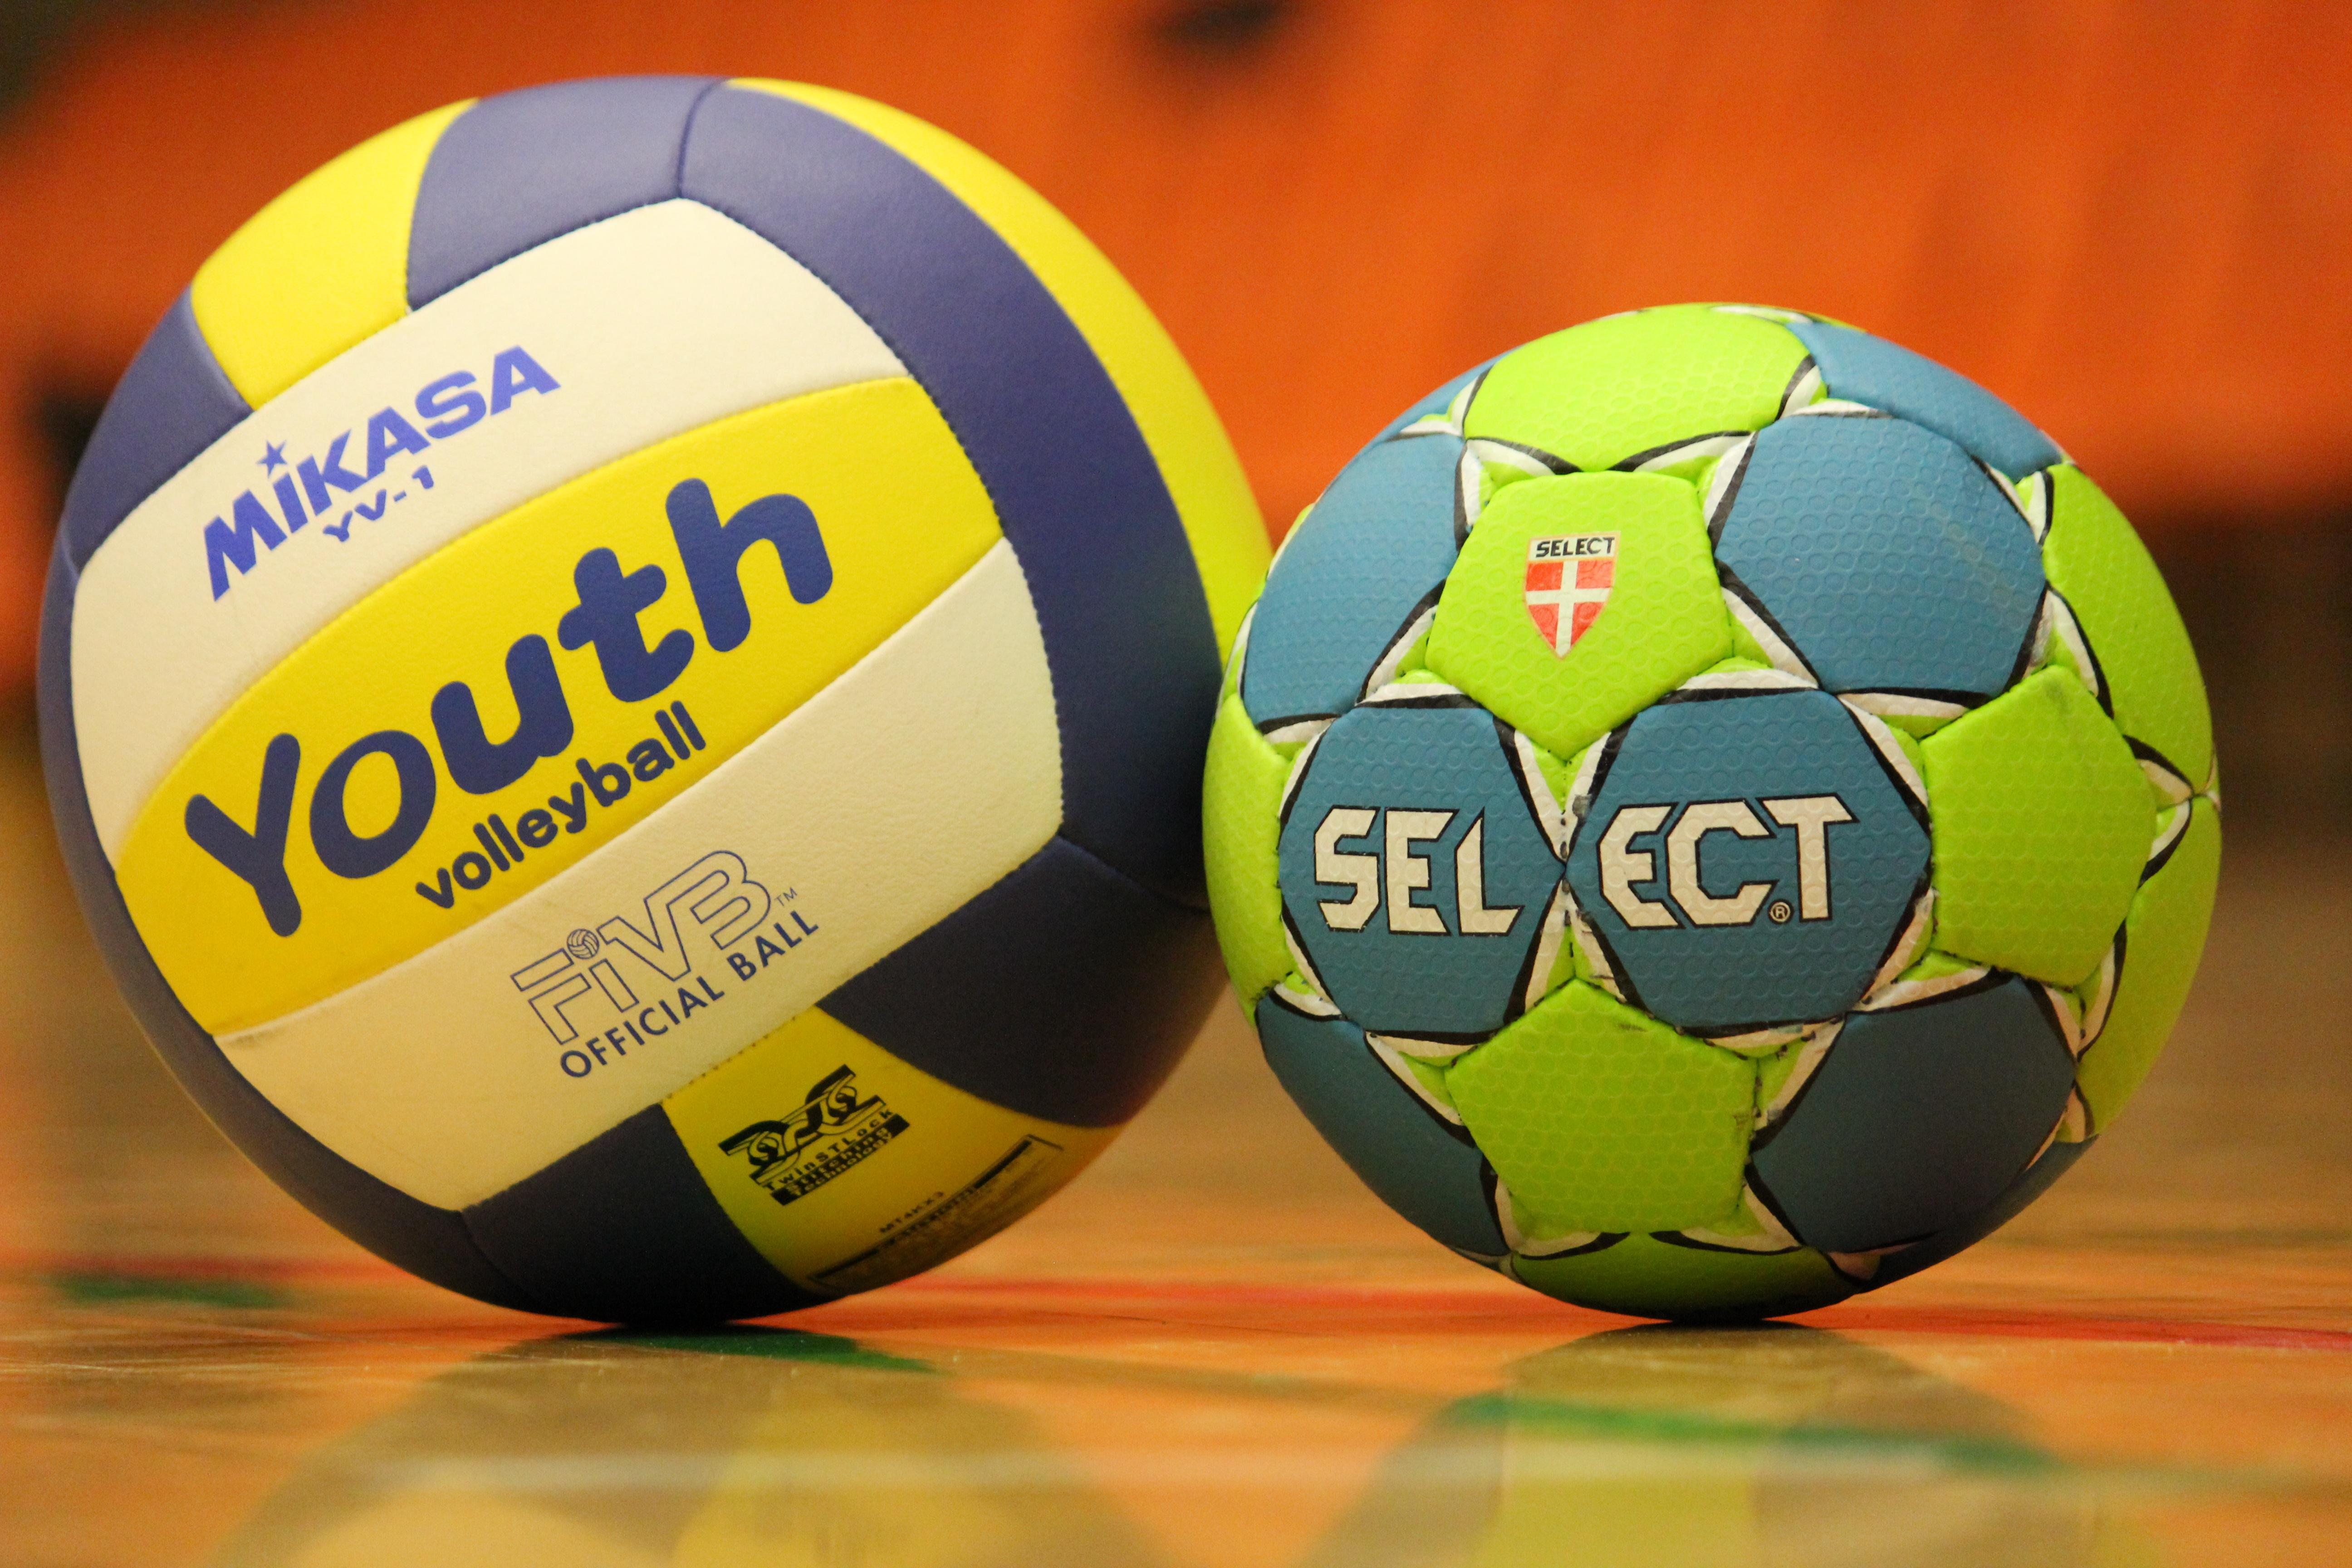 6dd7d3d5 hall opplæring gul Fotball mål sportsutstyr sport ball volleyball lag sport  håndball halgulv